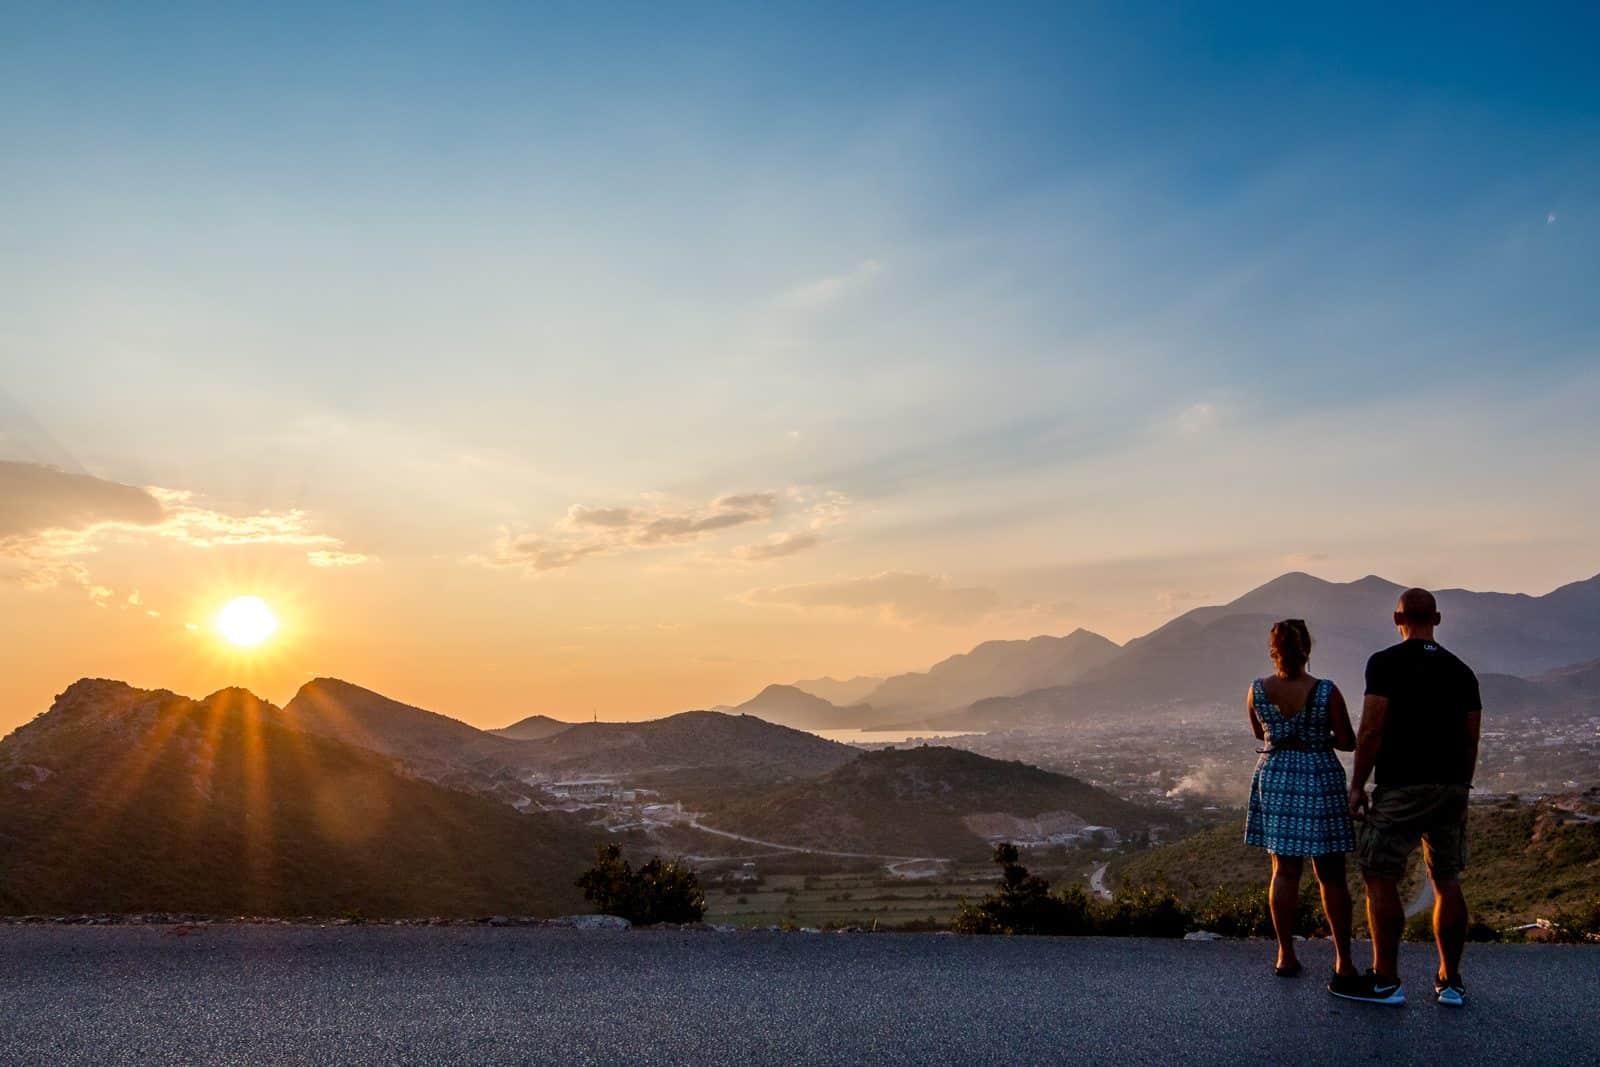 Sunset in Montenegro.